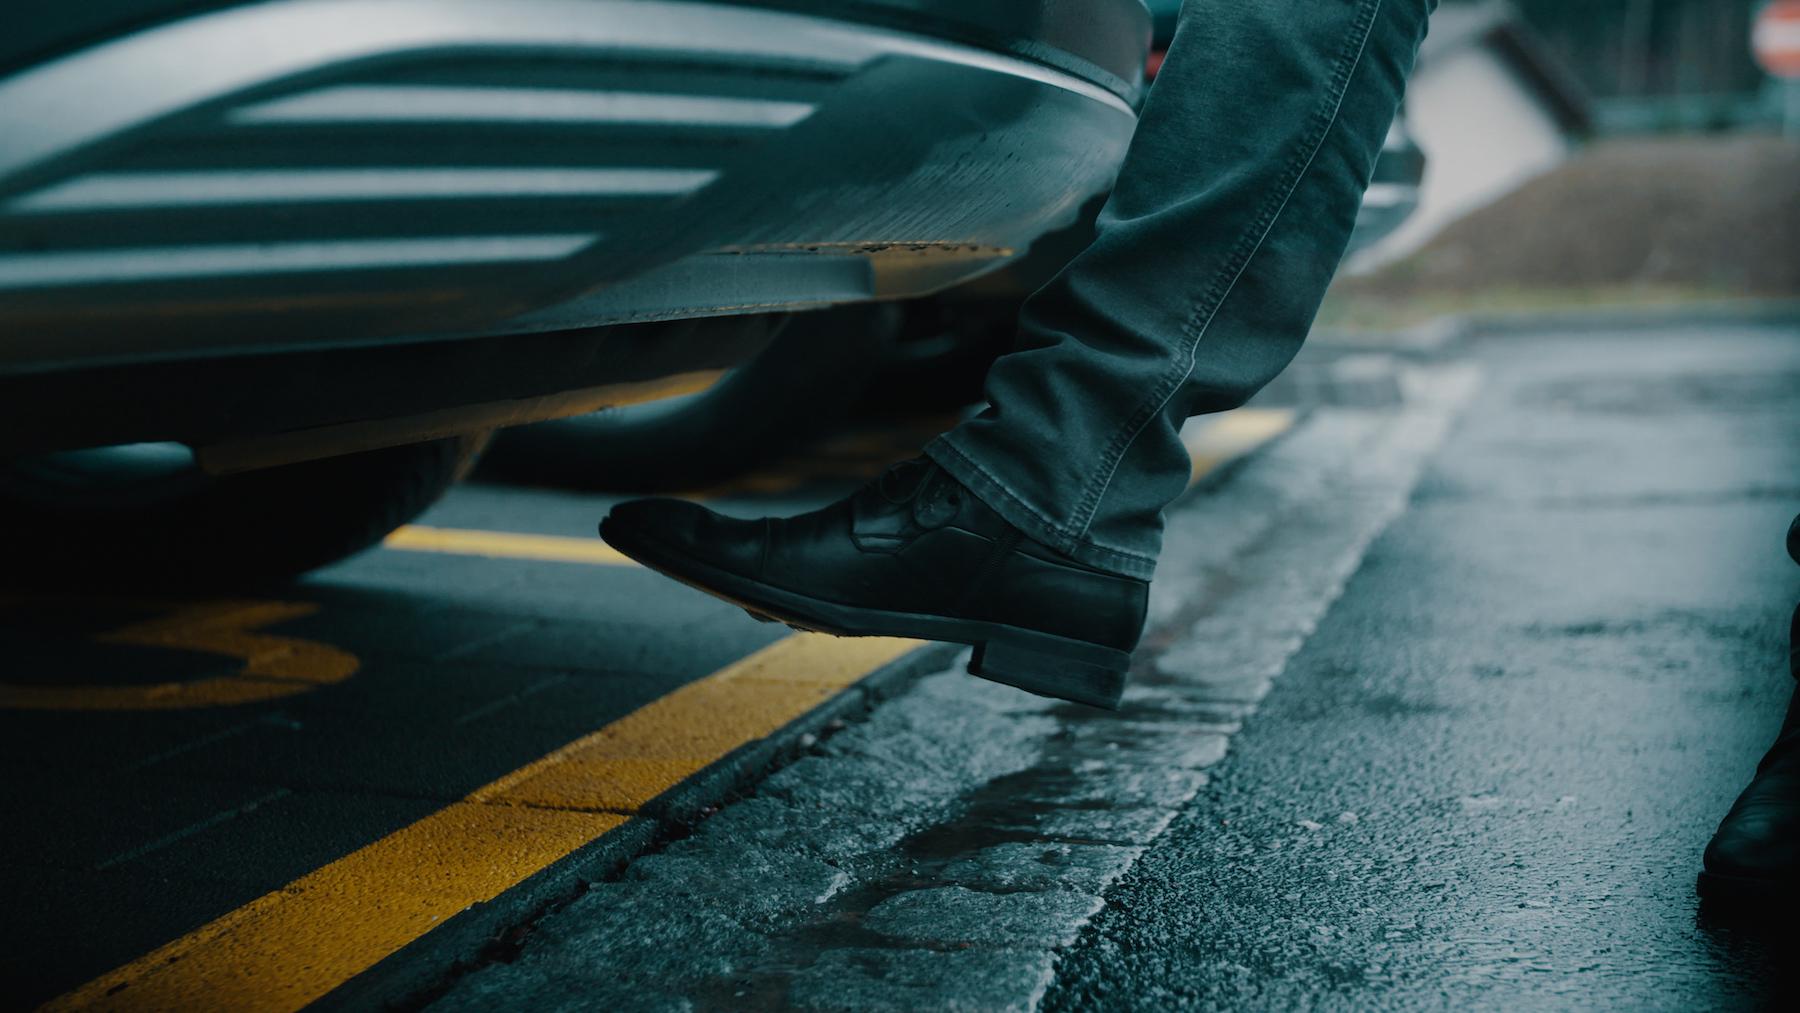 Die Kofferraumklappe des Audi e-tron kann man dank Virtual Pedal, einem Sensor mit dem Fuss öffnen.